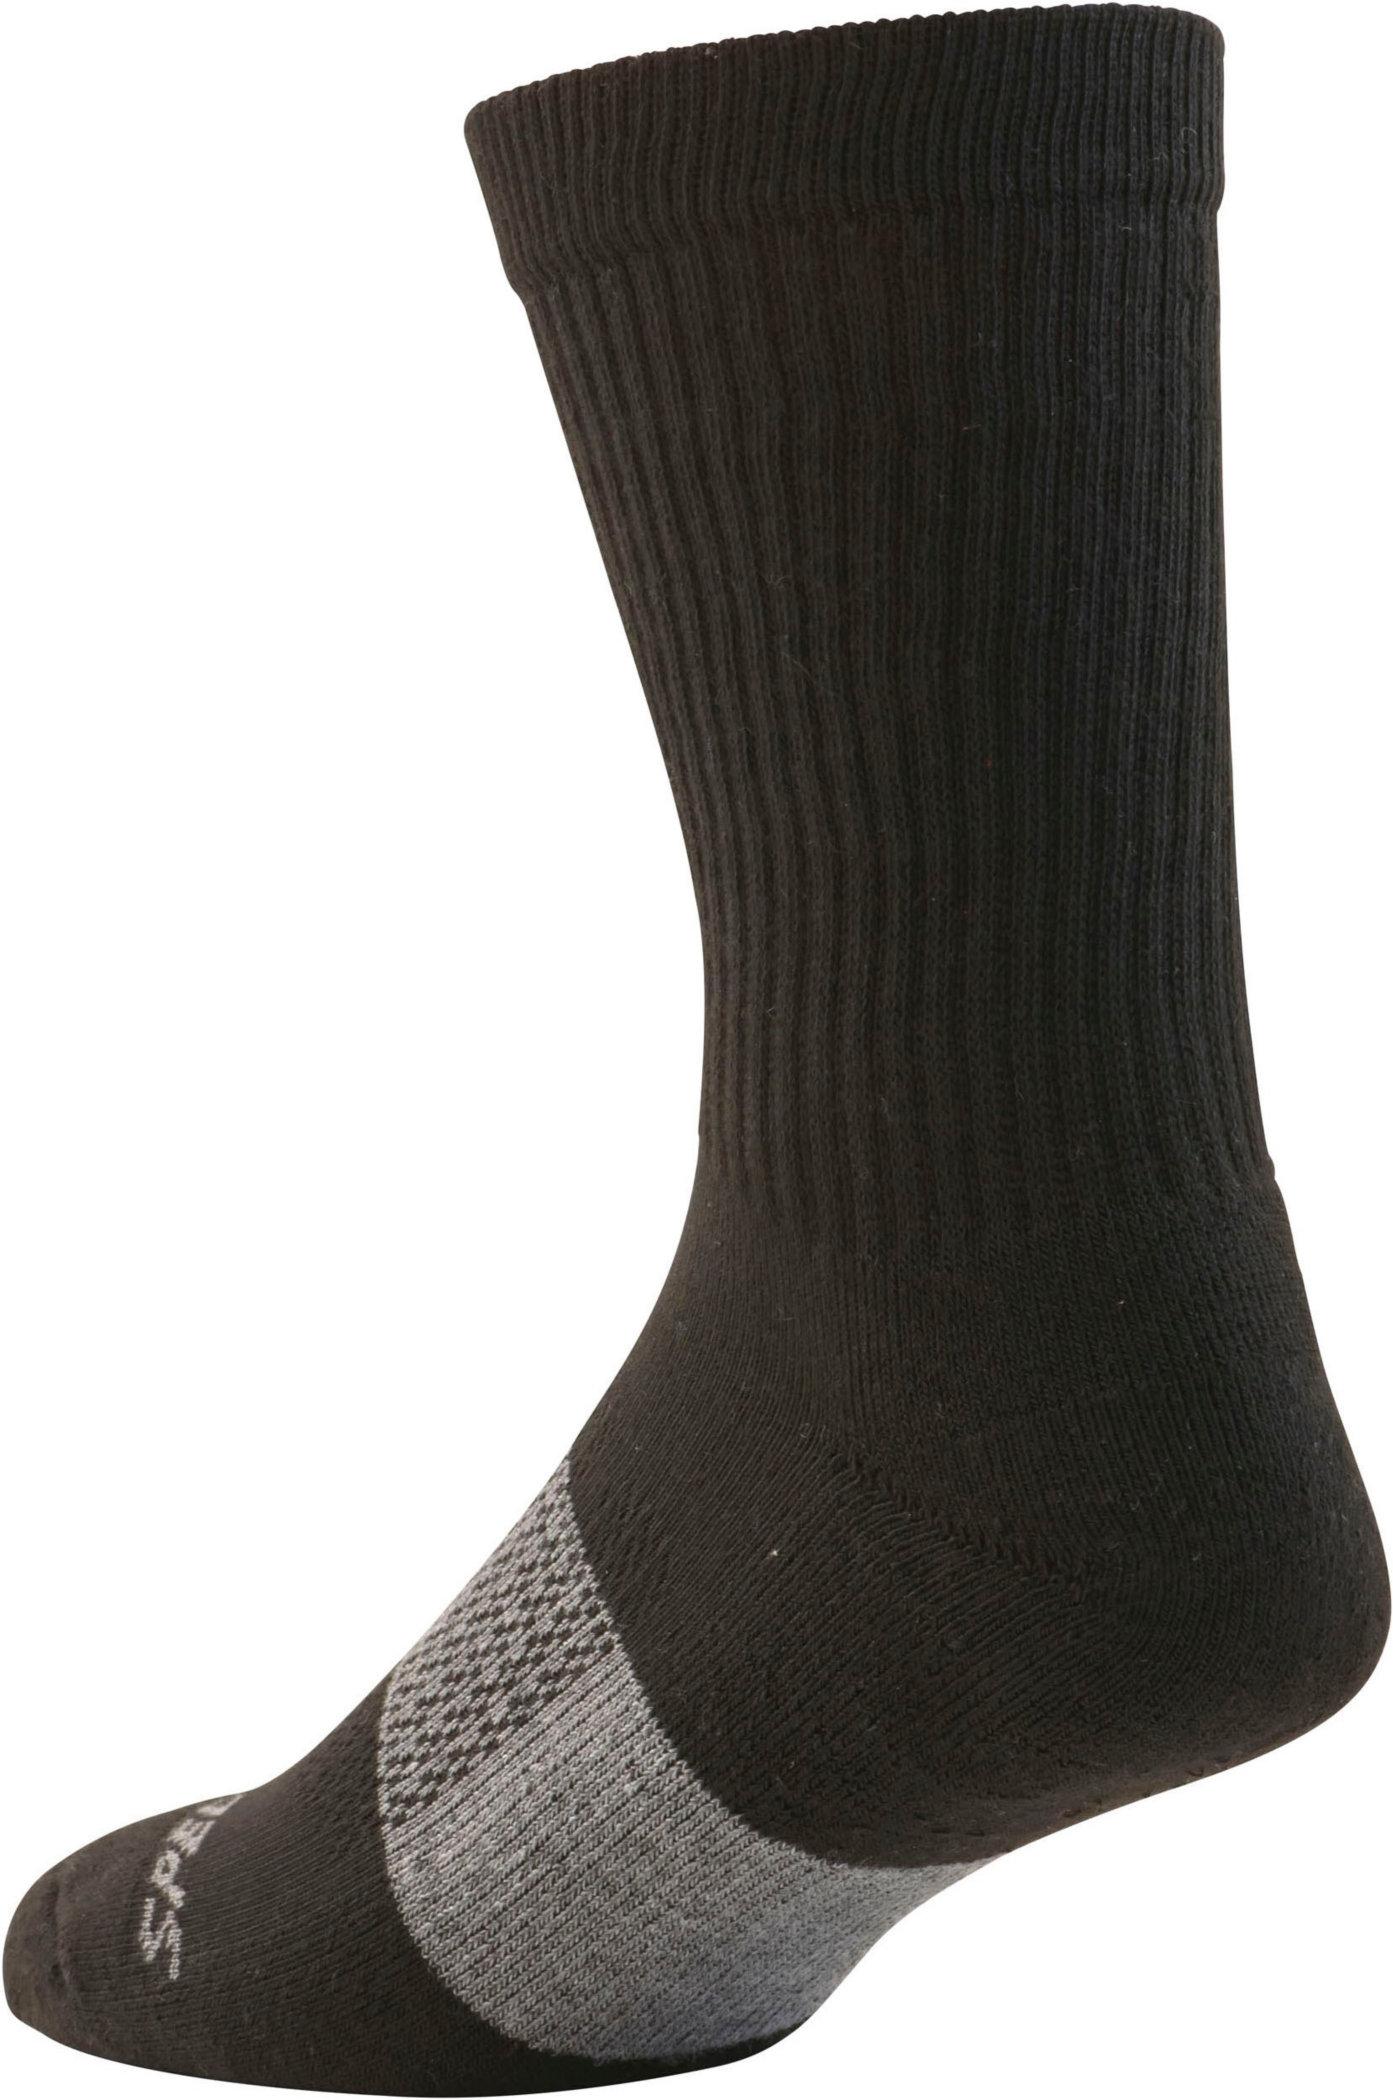 Specialized Women´s Mountain Tall Socks Black M/L - Alpha Bikes